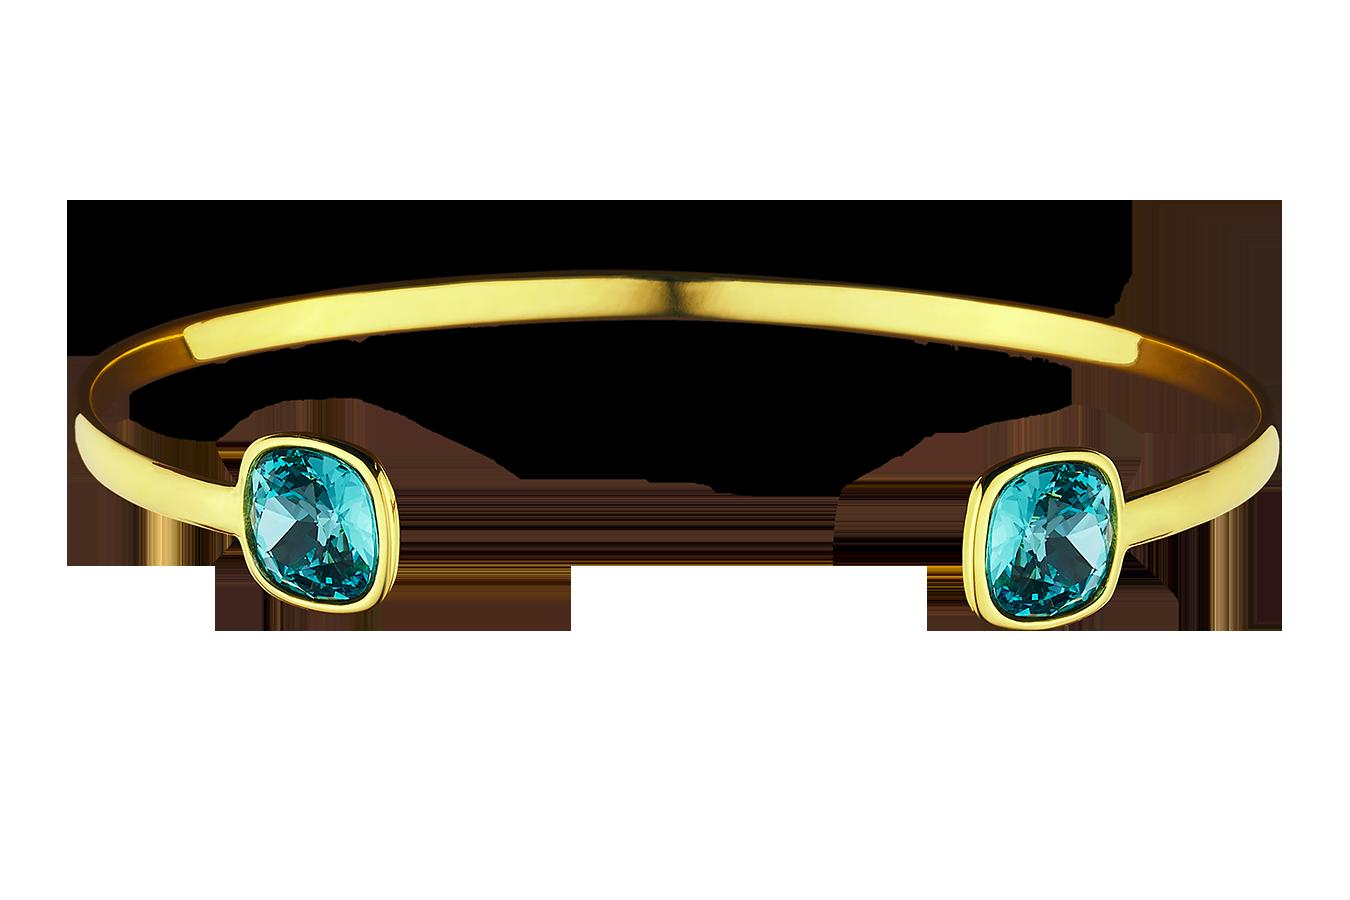 Bracciale Gold Turquoise